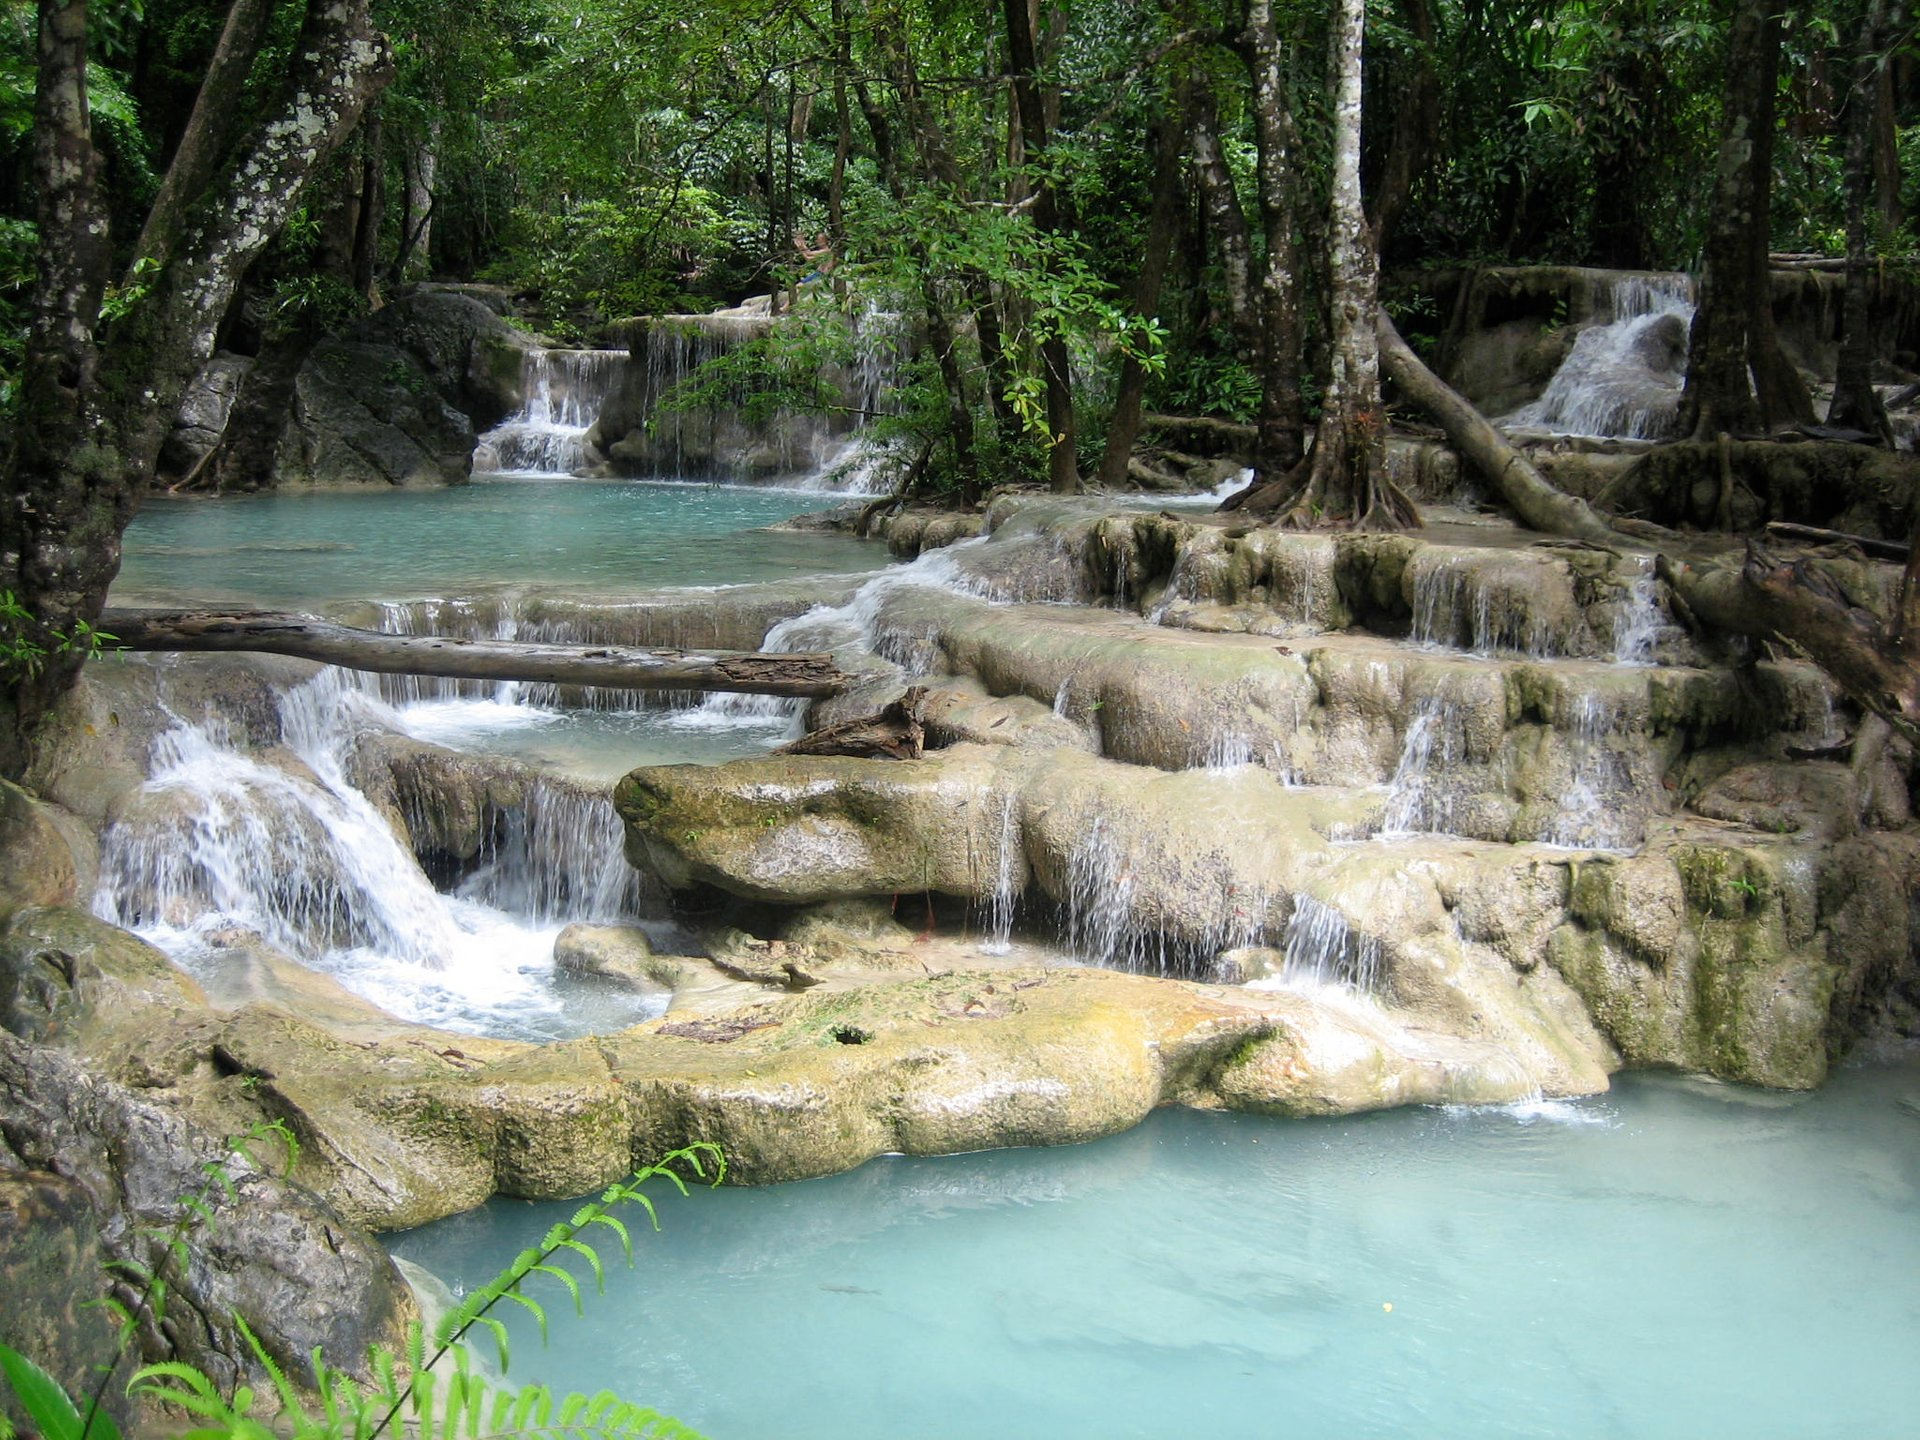 Erawan Falls in Thailand 2020 - Best Time